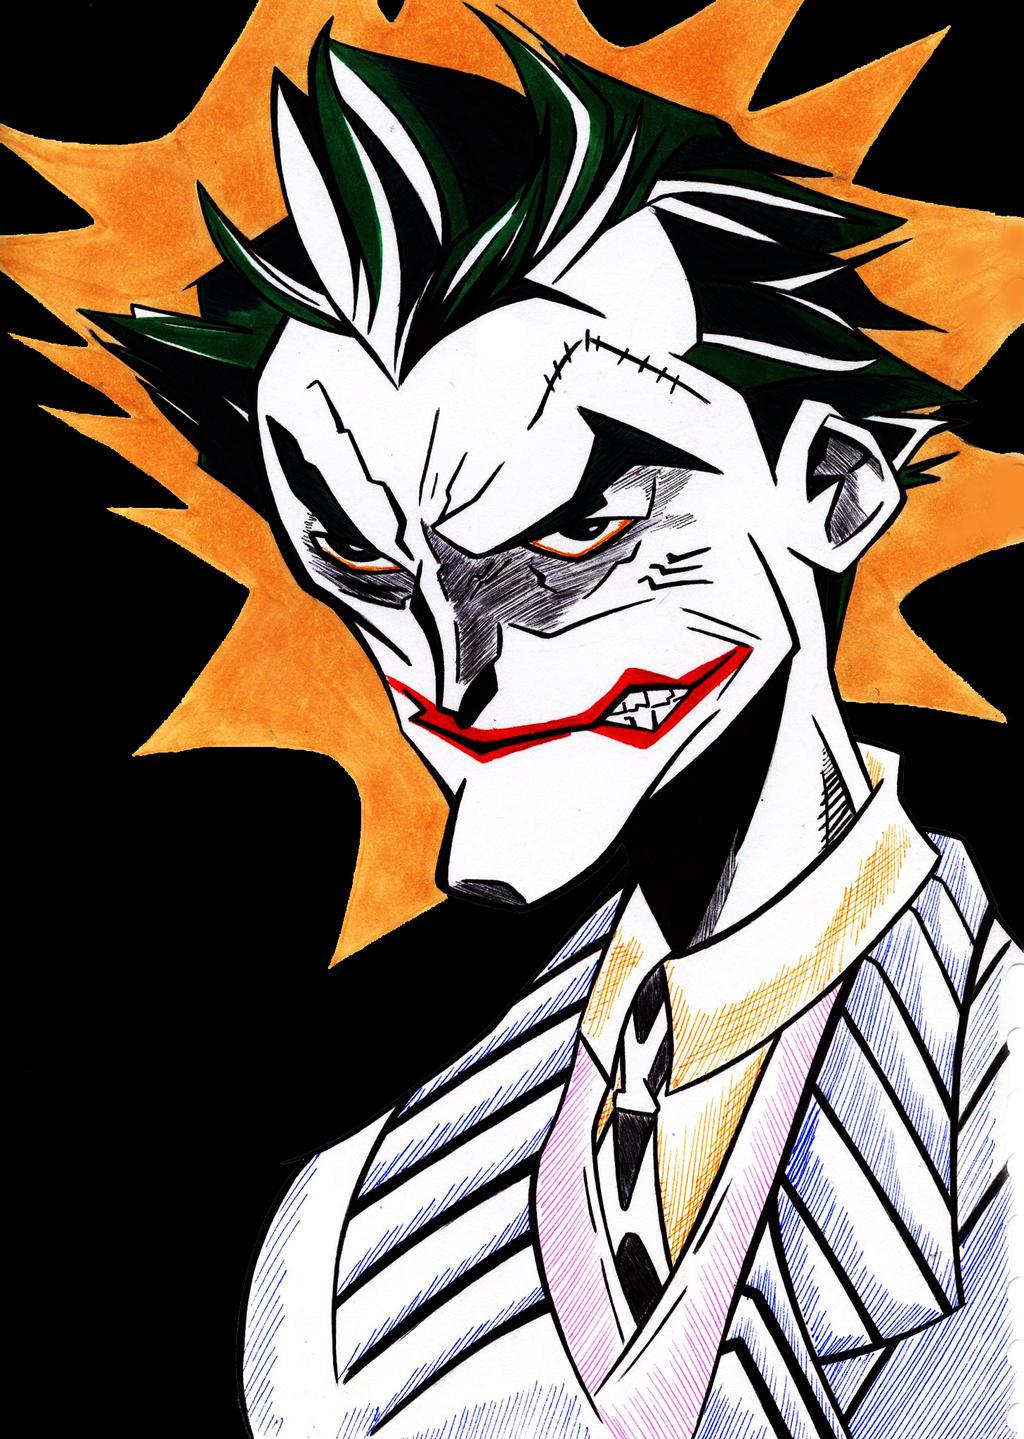 Joker Cumpleanero by mrpulp-presenta